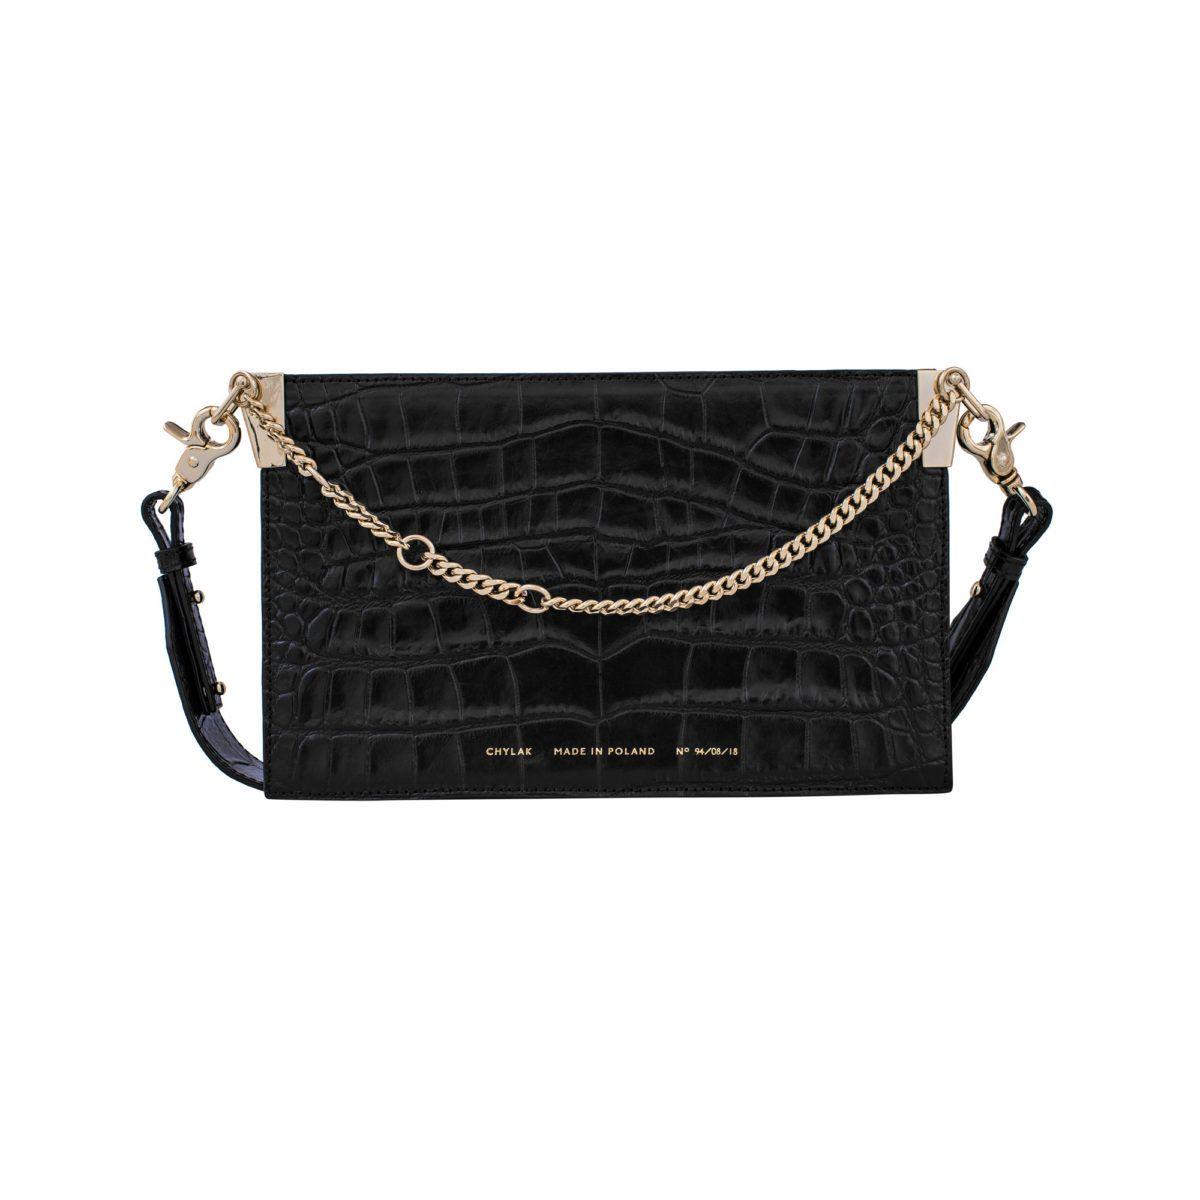 "de3361496 Chain Bag ""glossy black crocodile"" - Chylak   Clutch in 2019   Bags ..."